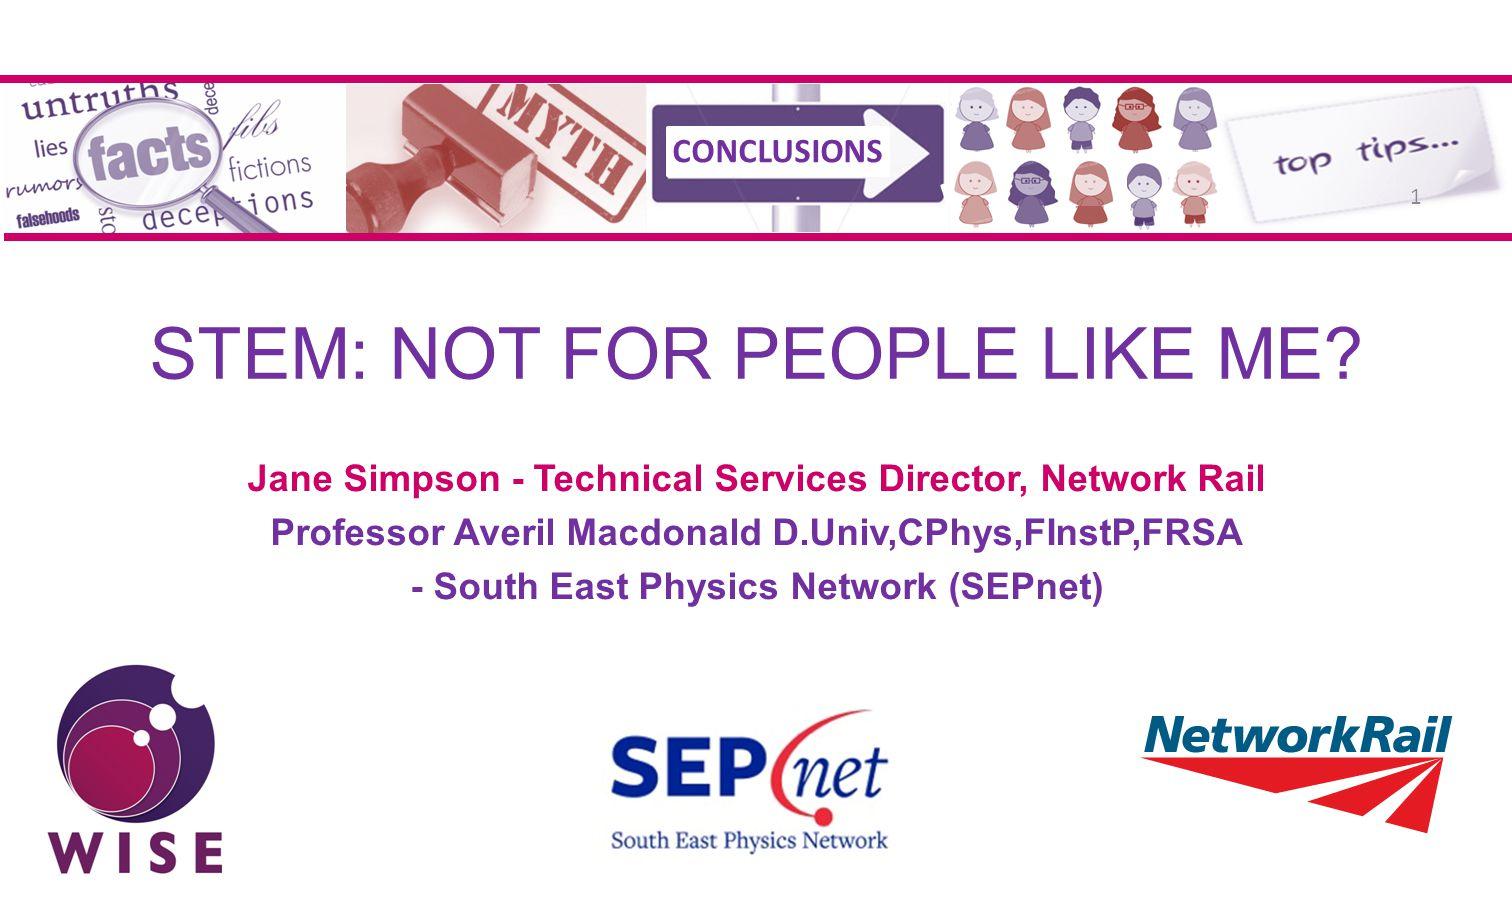 STEM: NOT FOR PEOPLE LIKE ME? Jane Simpson - Technical Services Director, Network Rail Professor Averil Macdonald D.Univ,CPhys,FInstP,FRSA - South Eas